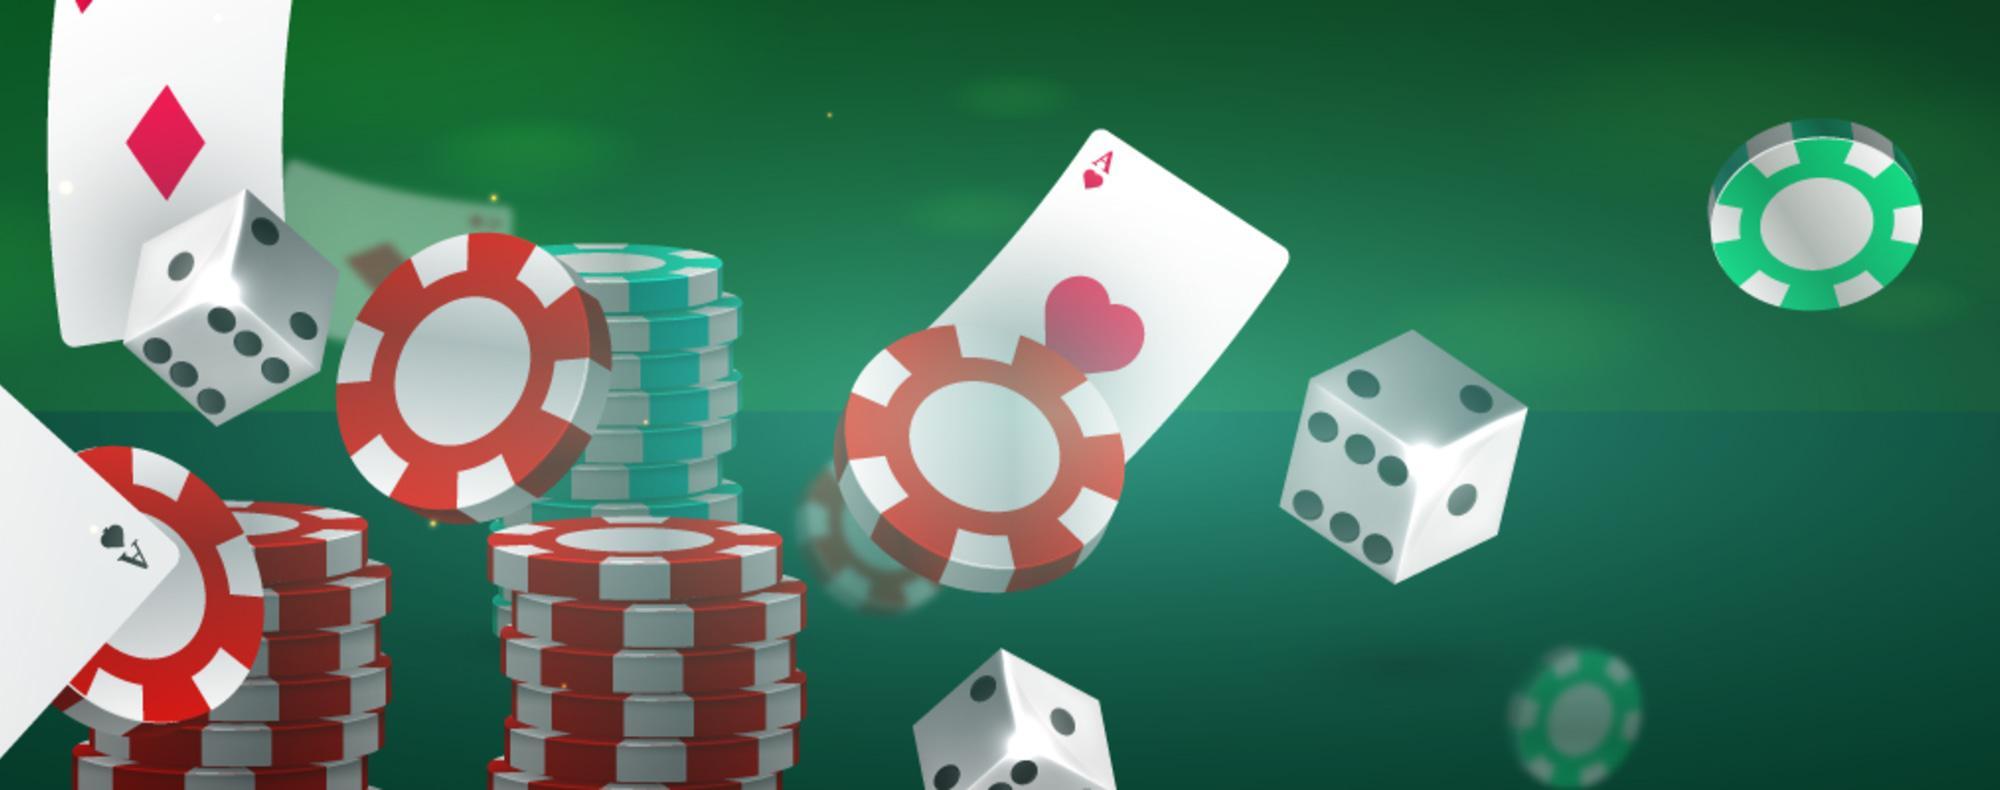 Bits casino 148933